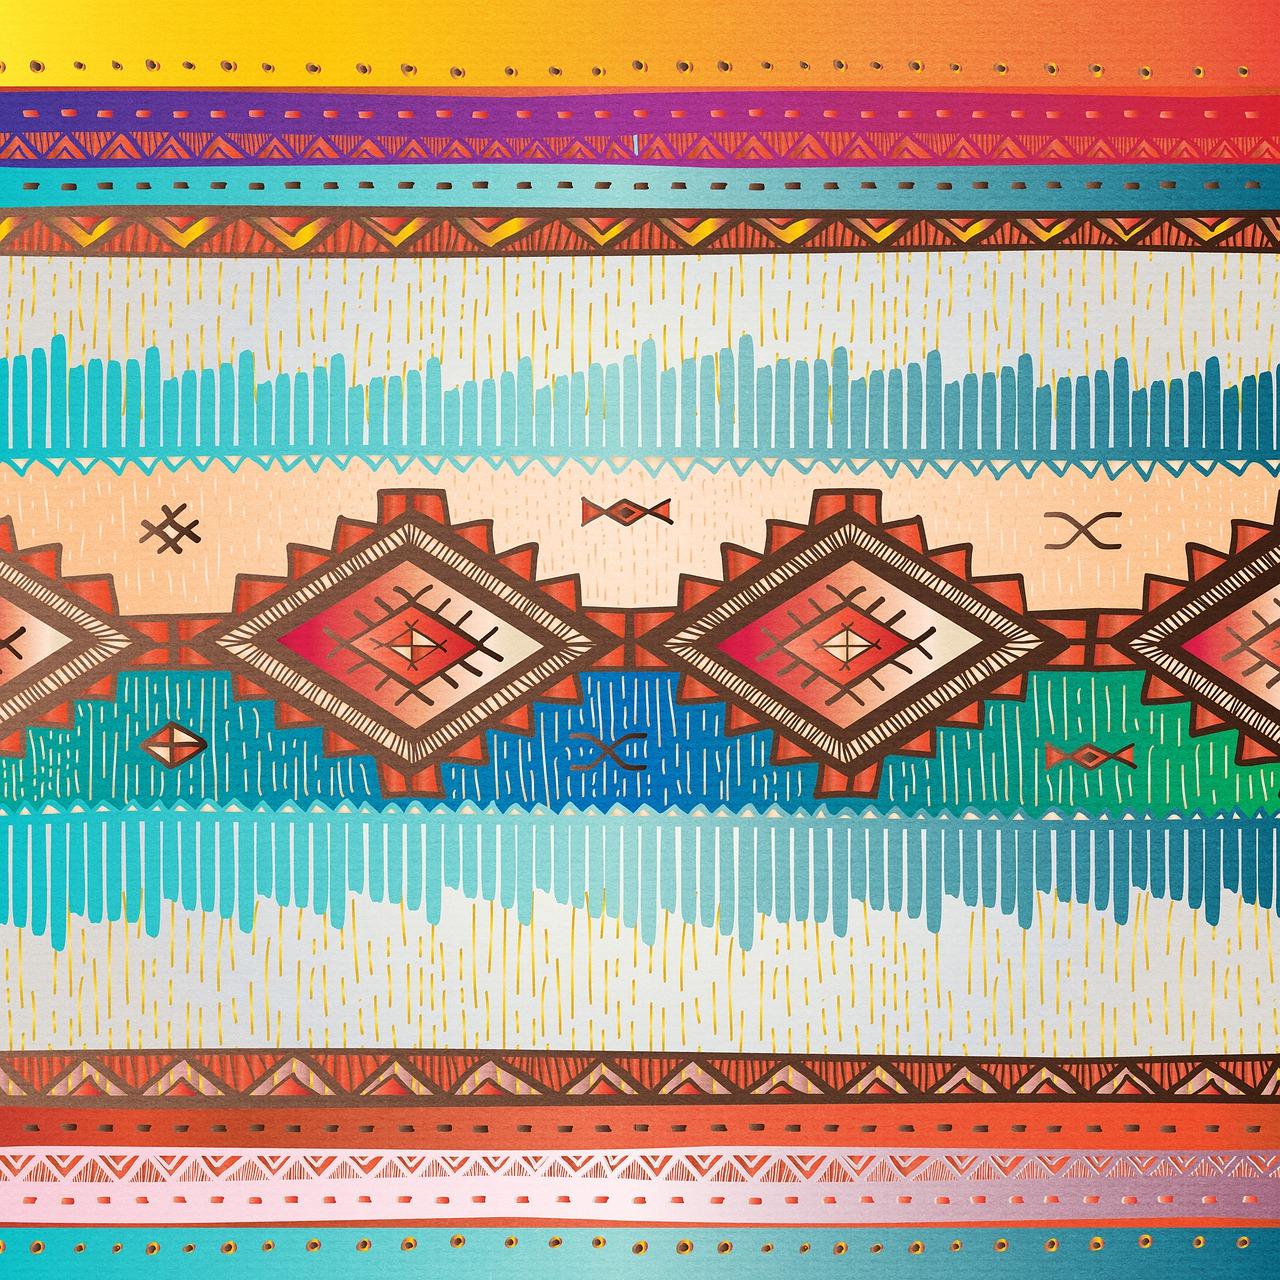 Digital Paper African Tribal Free Image On Pixabay